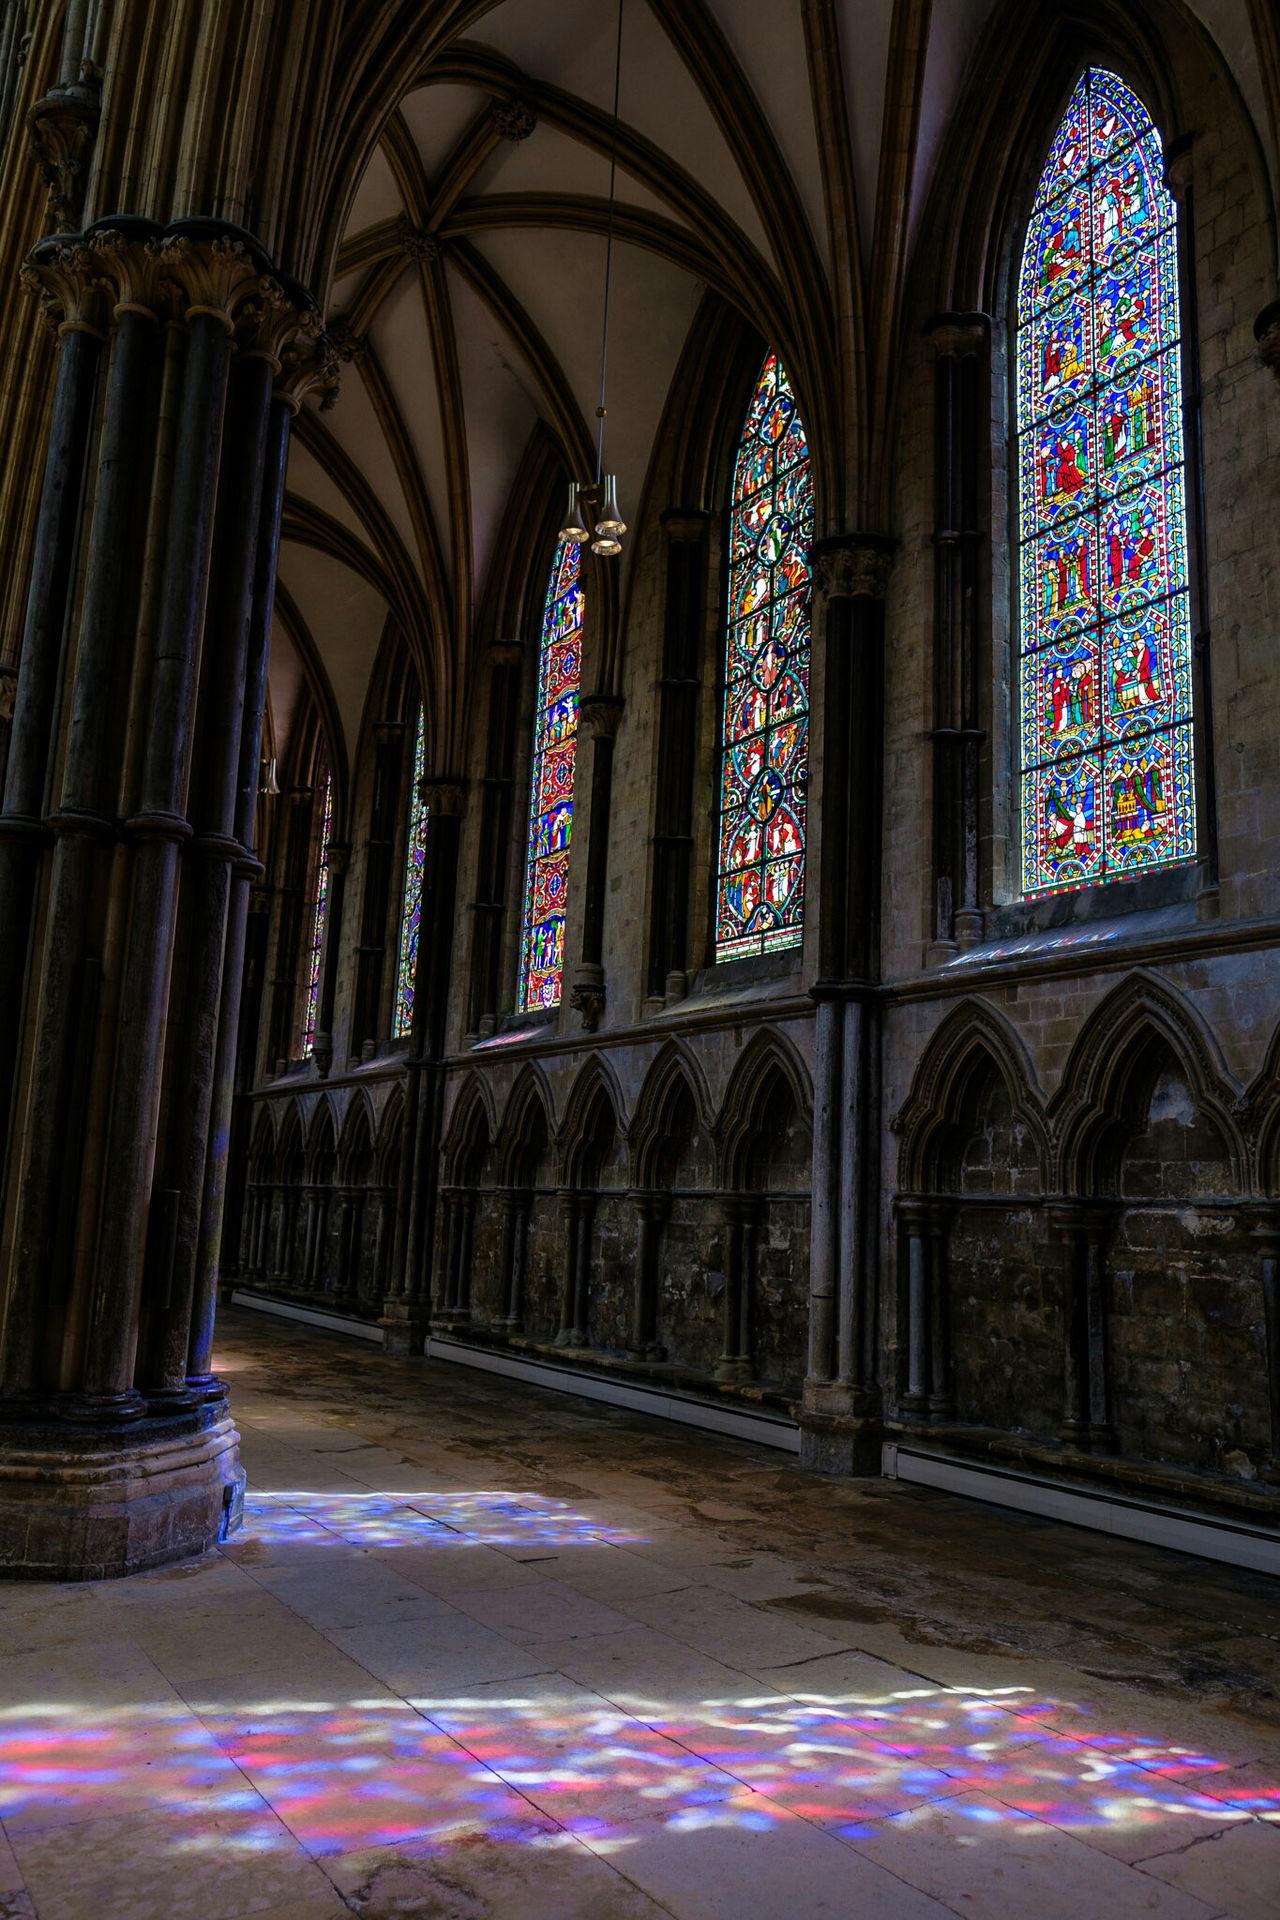 Photography Fujifilm X-pro2 Fujifilm Lincoln Cathedral Lincoln City Xseries